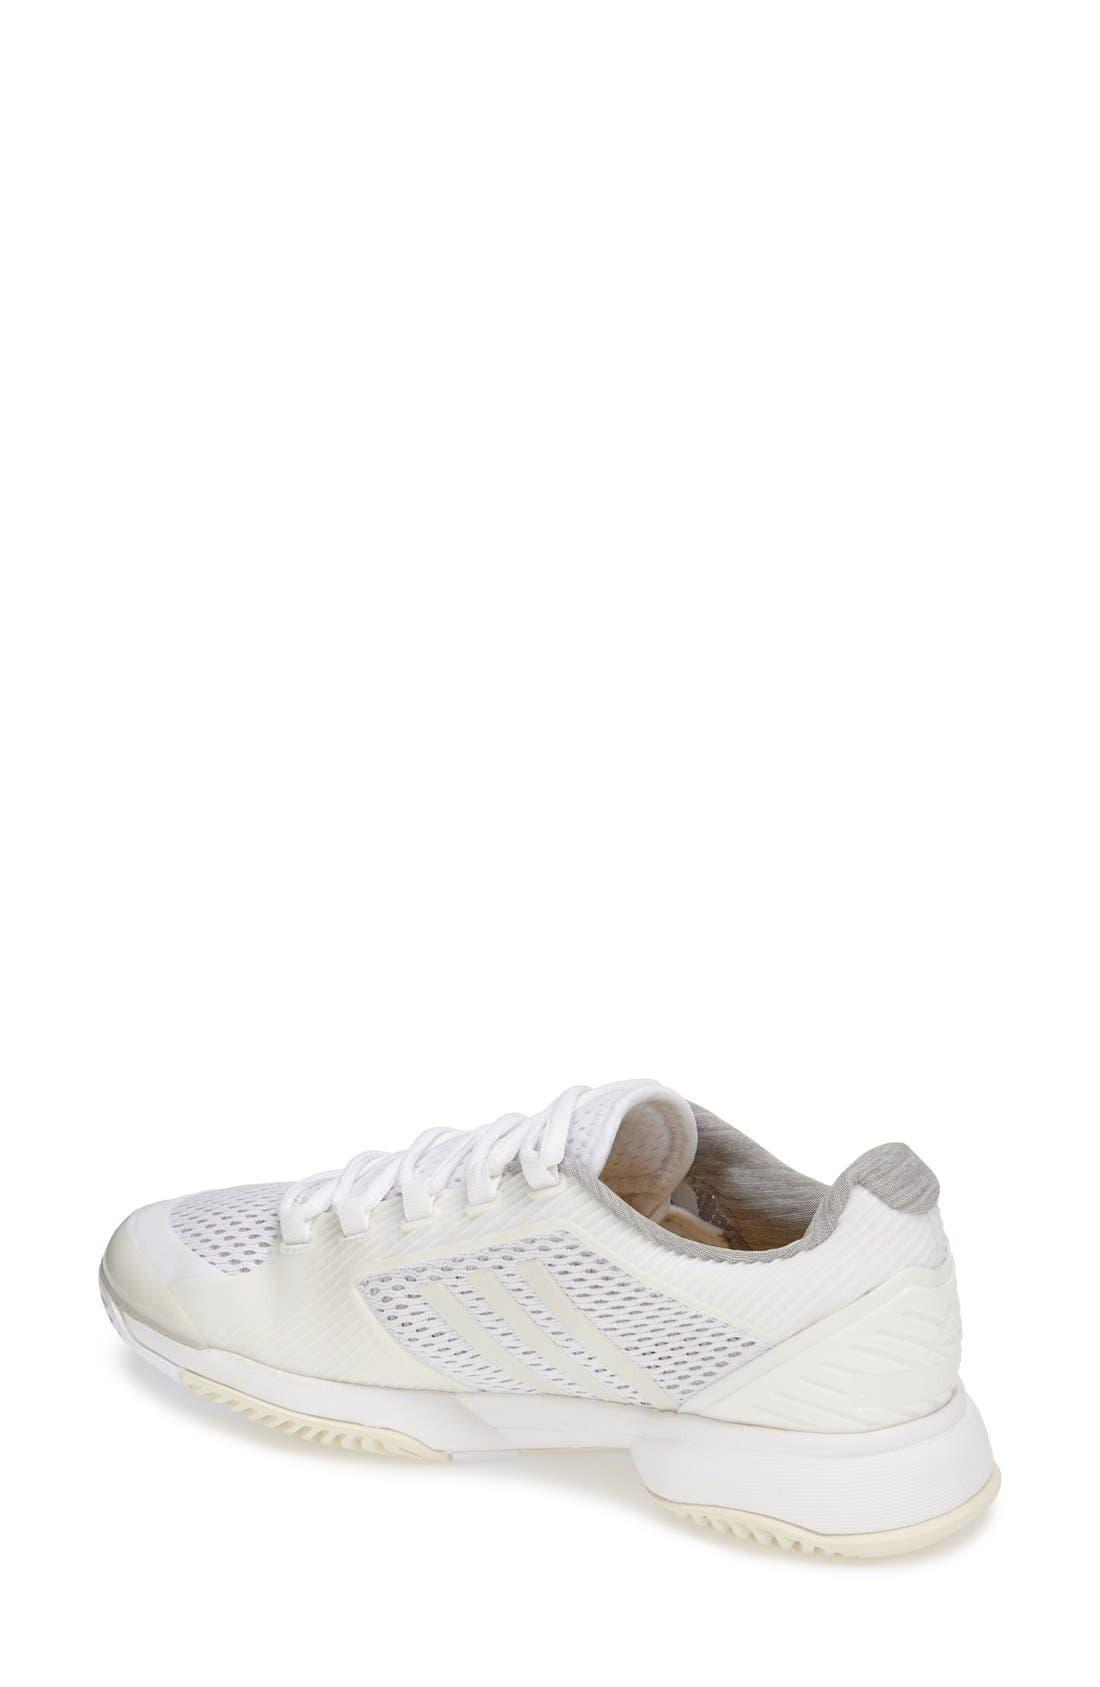 Alternate Image 2  - adidas 'Stella McCartney - Barricade 2015' Tennis Shoe (Women)